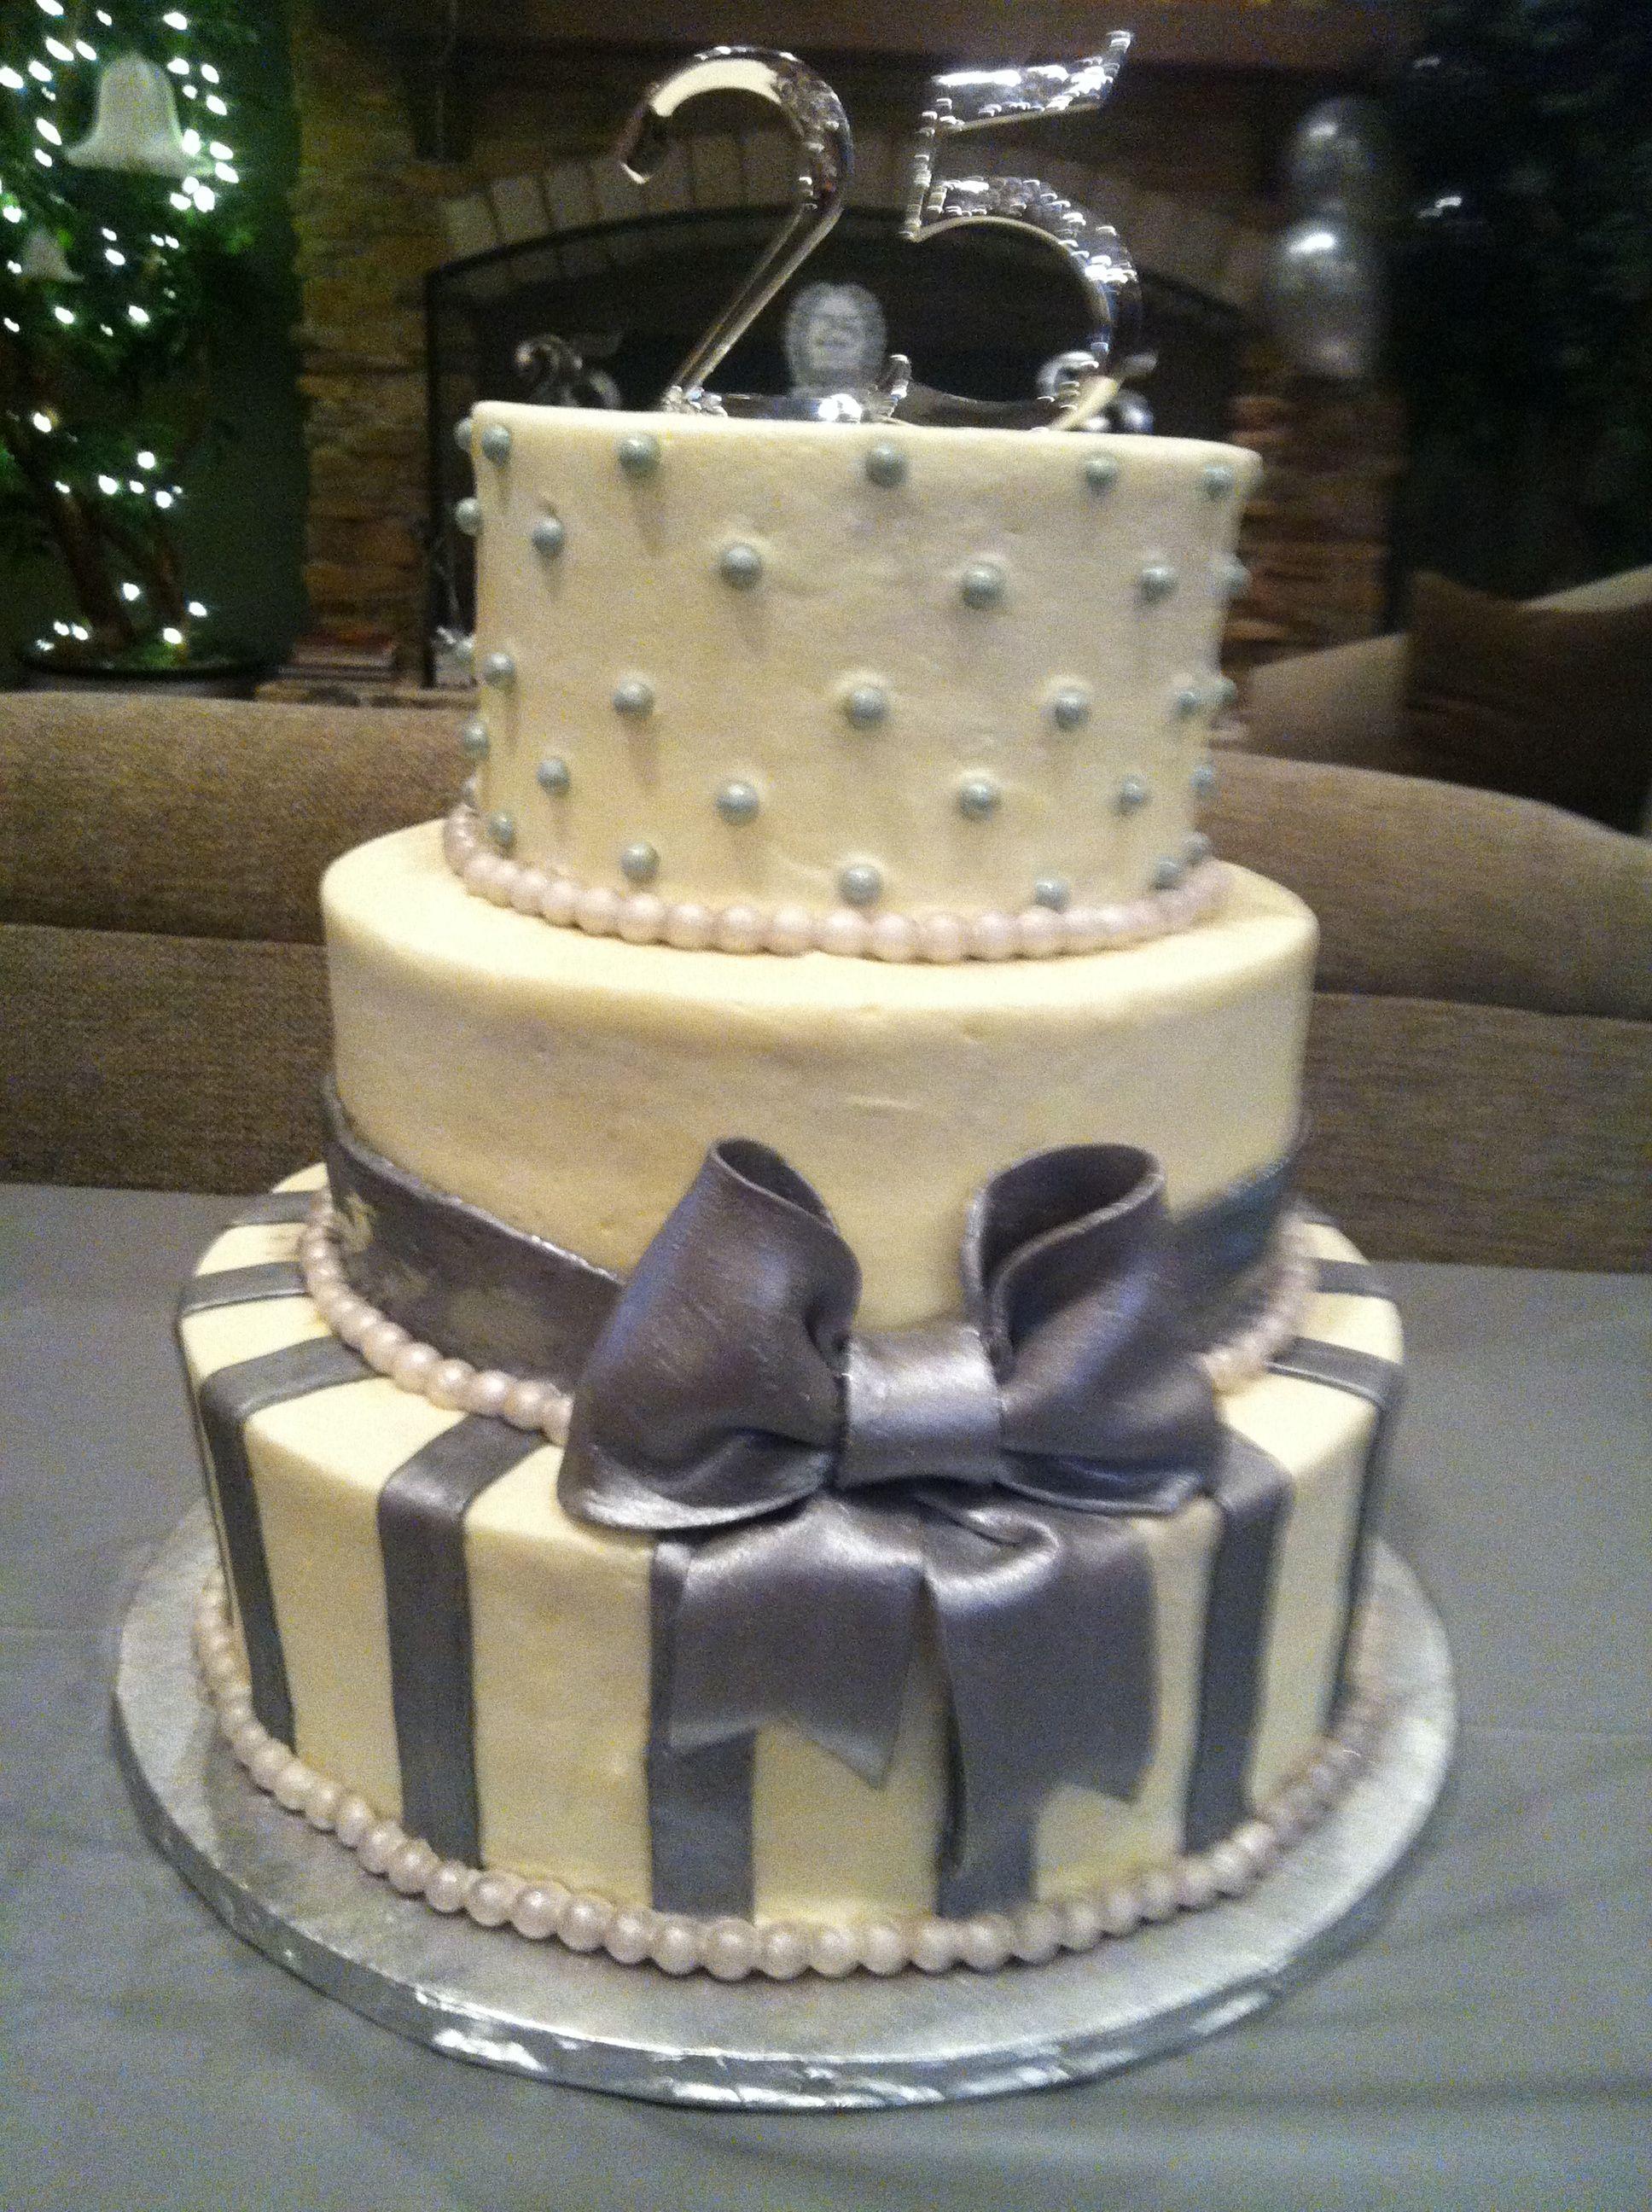 Victor & Nenita's Silver Anniversary custom cake by www.everylittlesweet.com